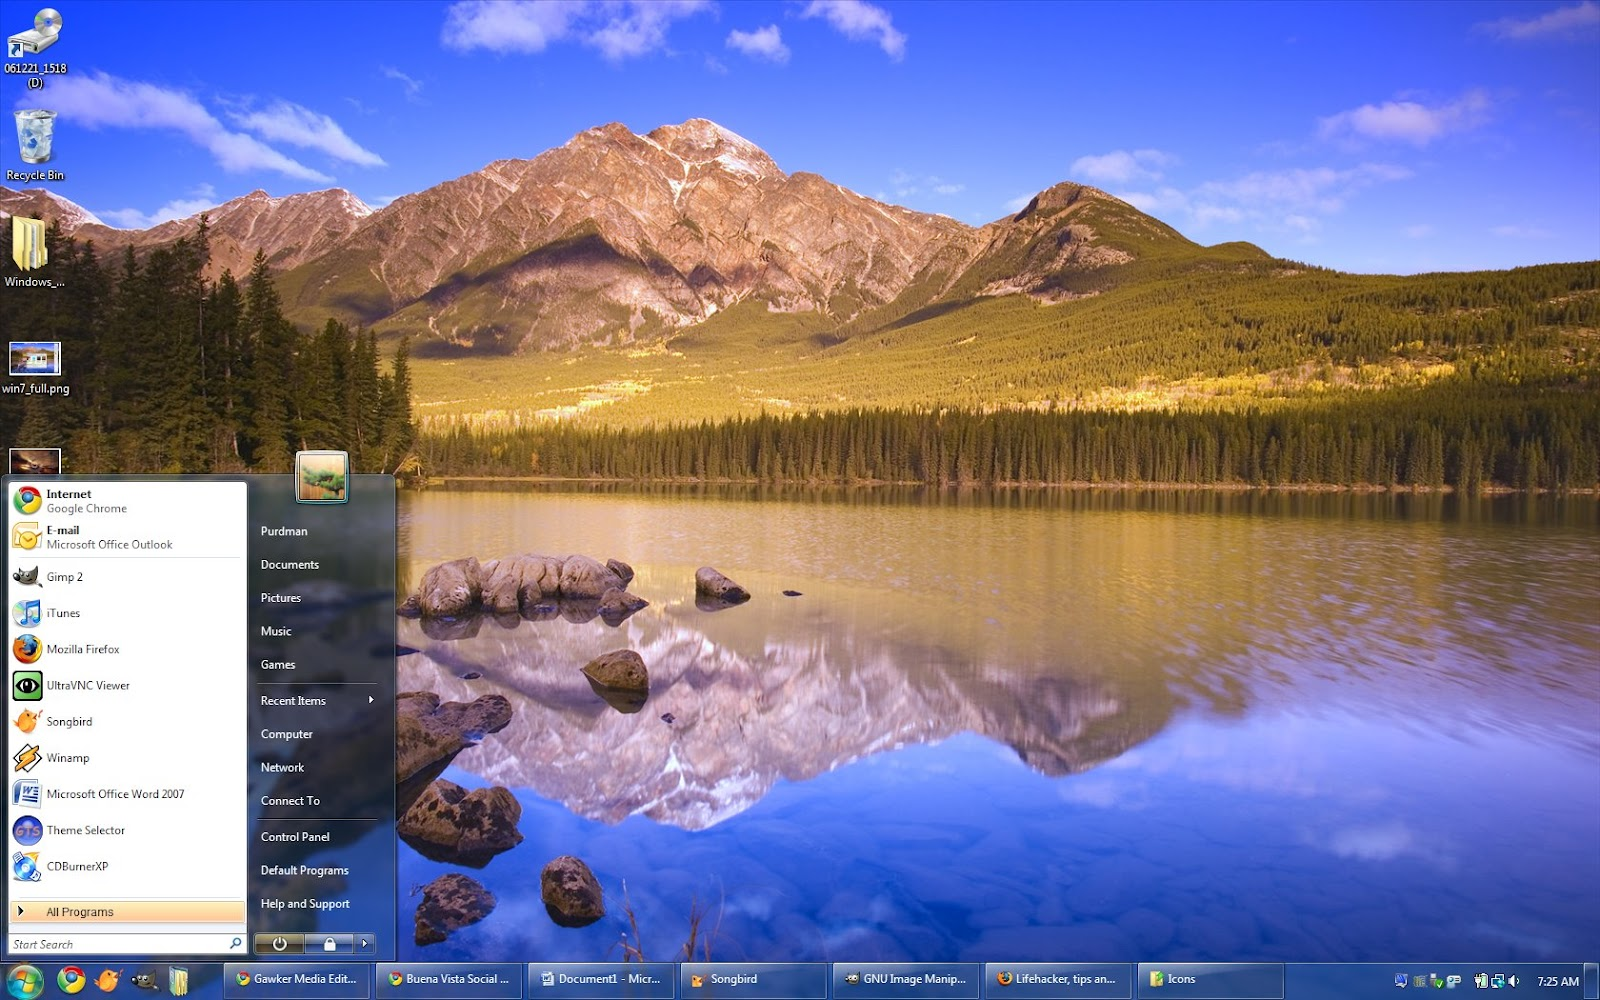 Windows 7 desktop themes mobile wallpapers - Windows 7 love wallpapers ...